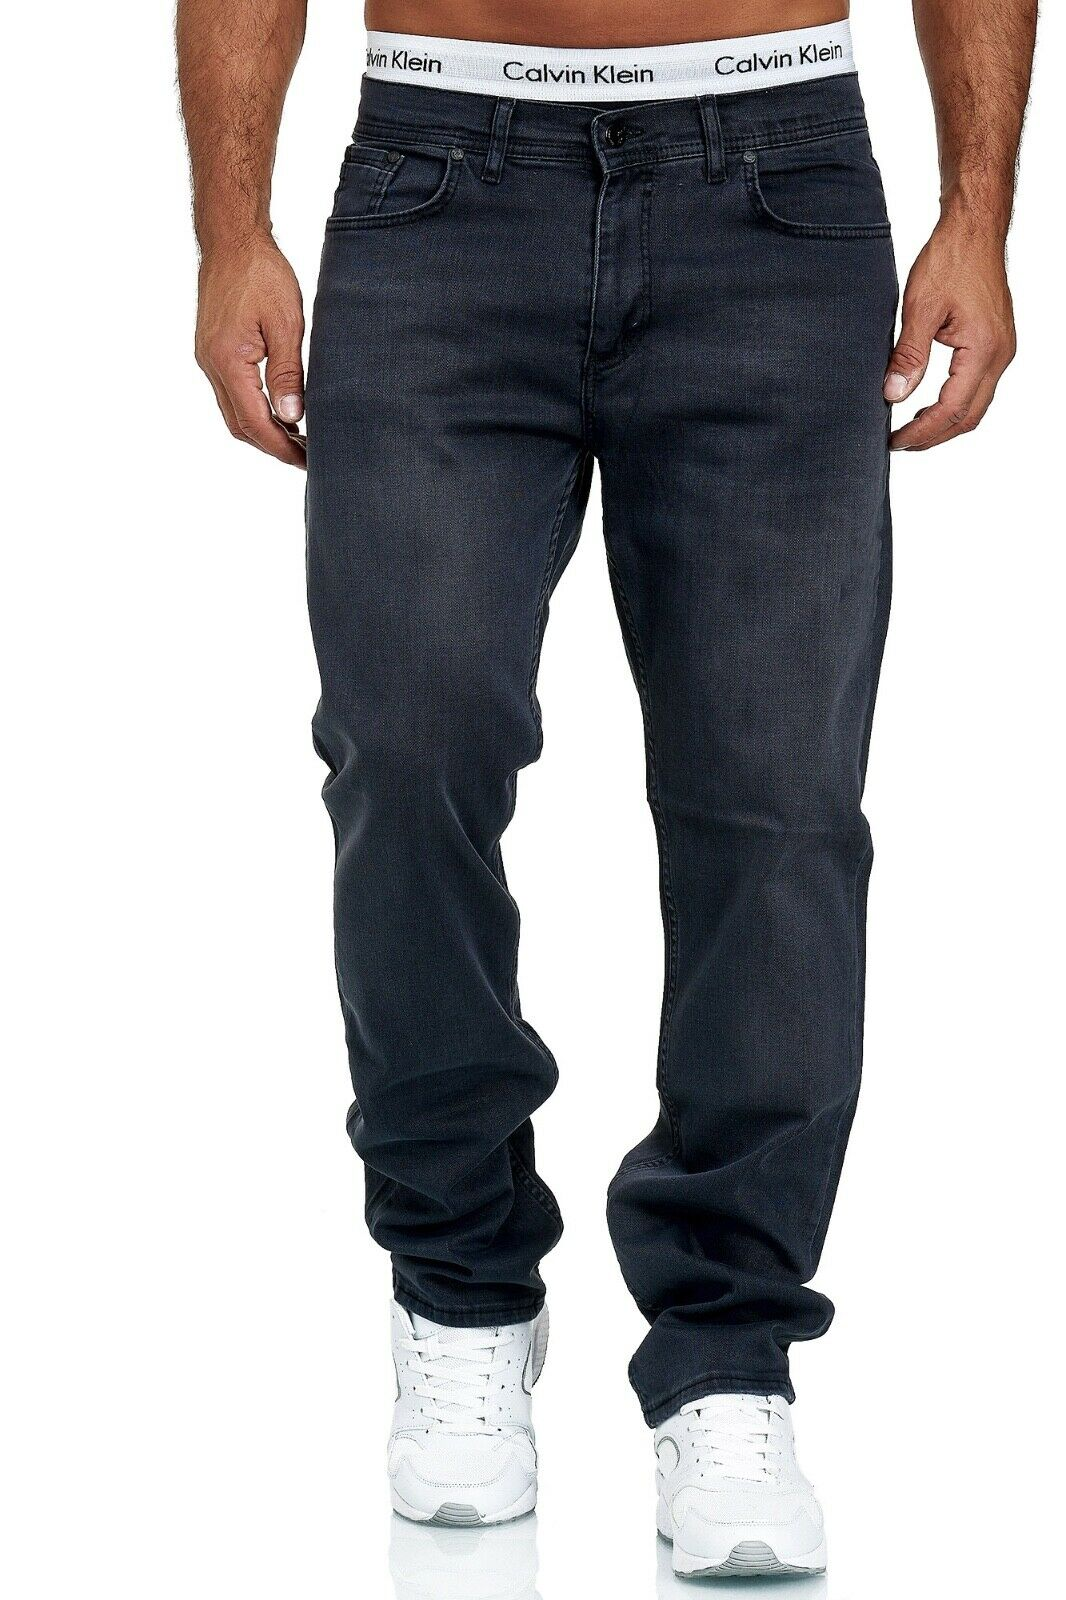 Herren-Jeans-Hose-Denim-KC-Black-Washed-Straight-Cut-Regular-Dicke-Naht-naehte Indexbild 81